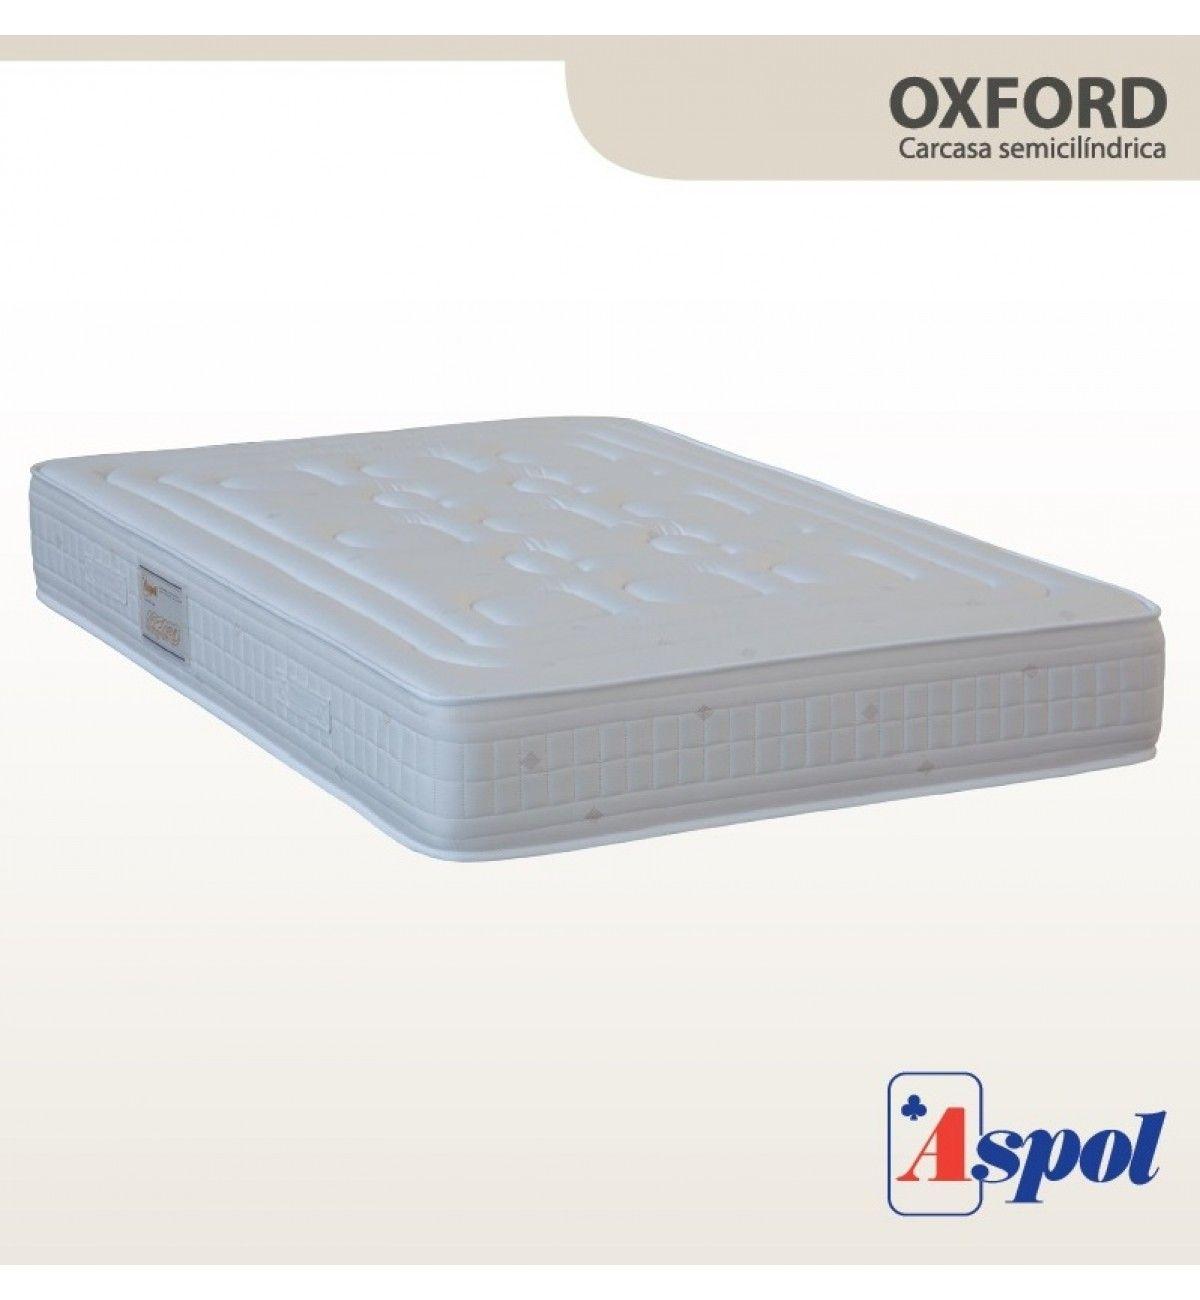 Aspol Oxford Colchón